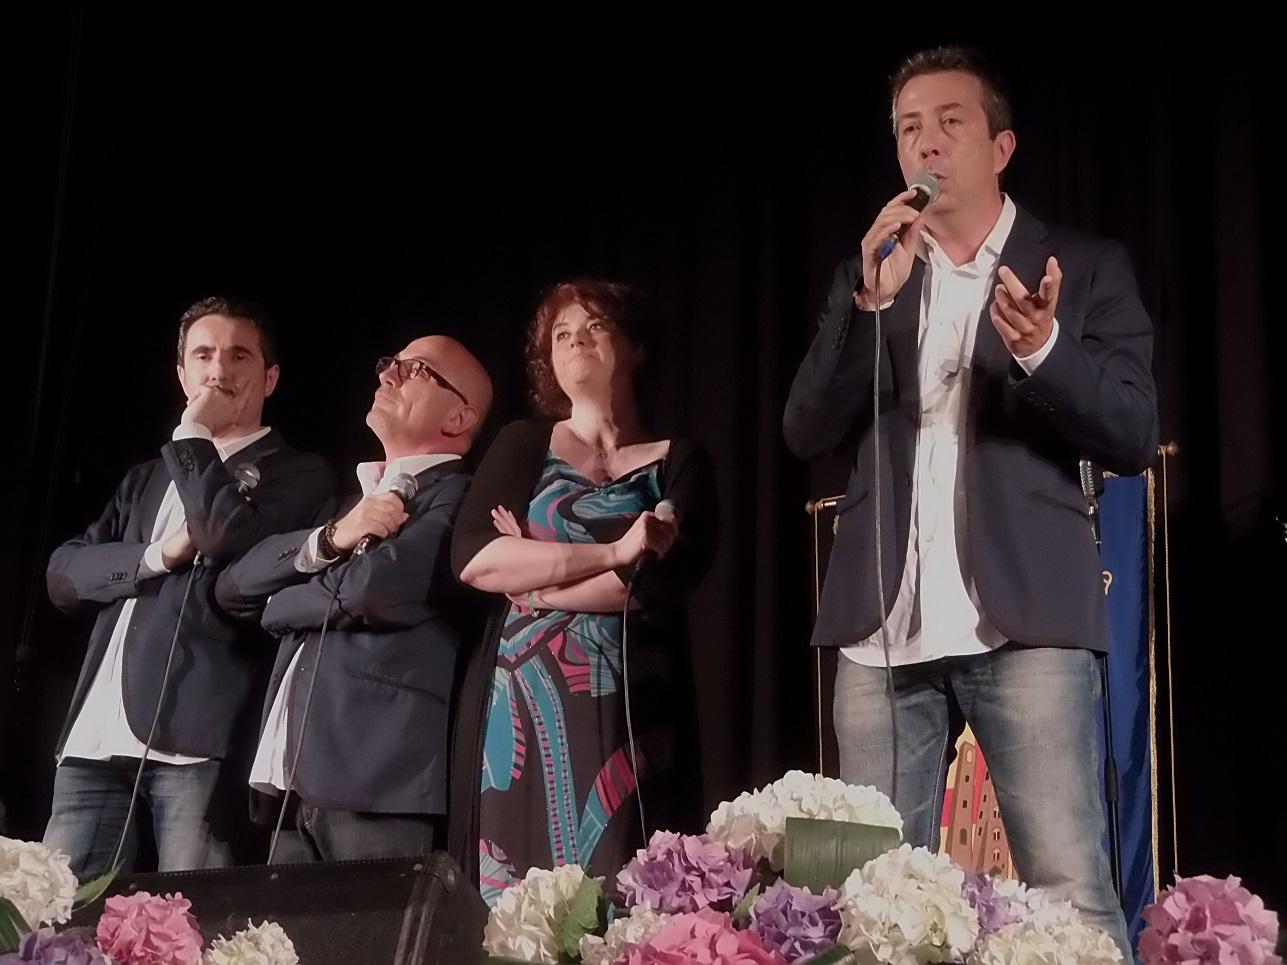 Albenga 19.07.2014